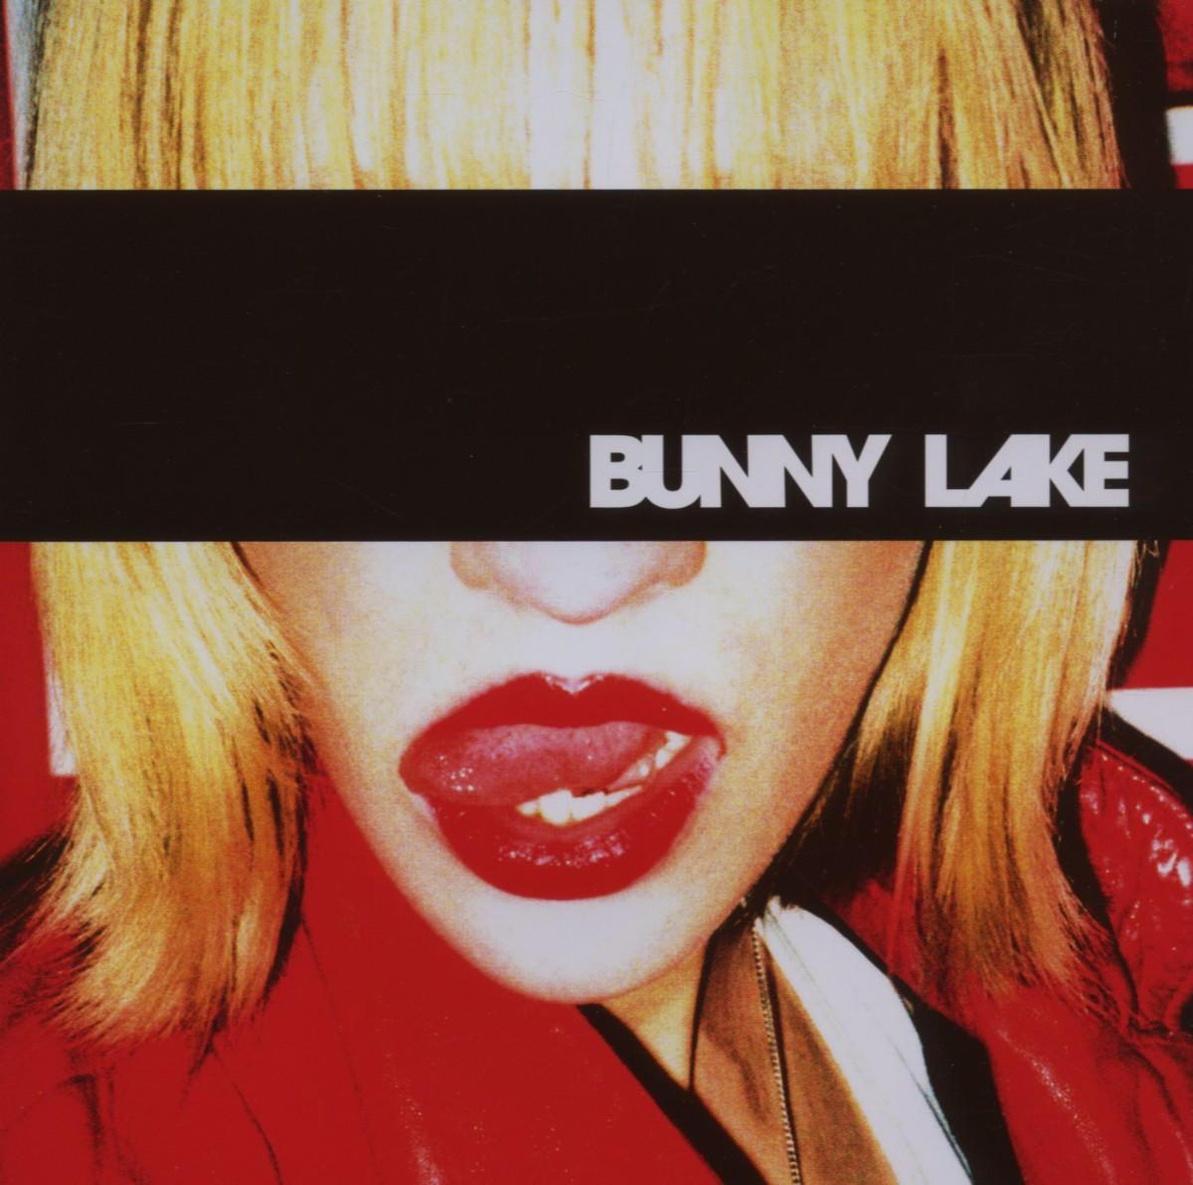 Bunny Lake - The Church of Bunny Lake